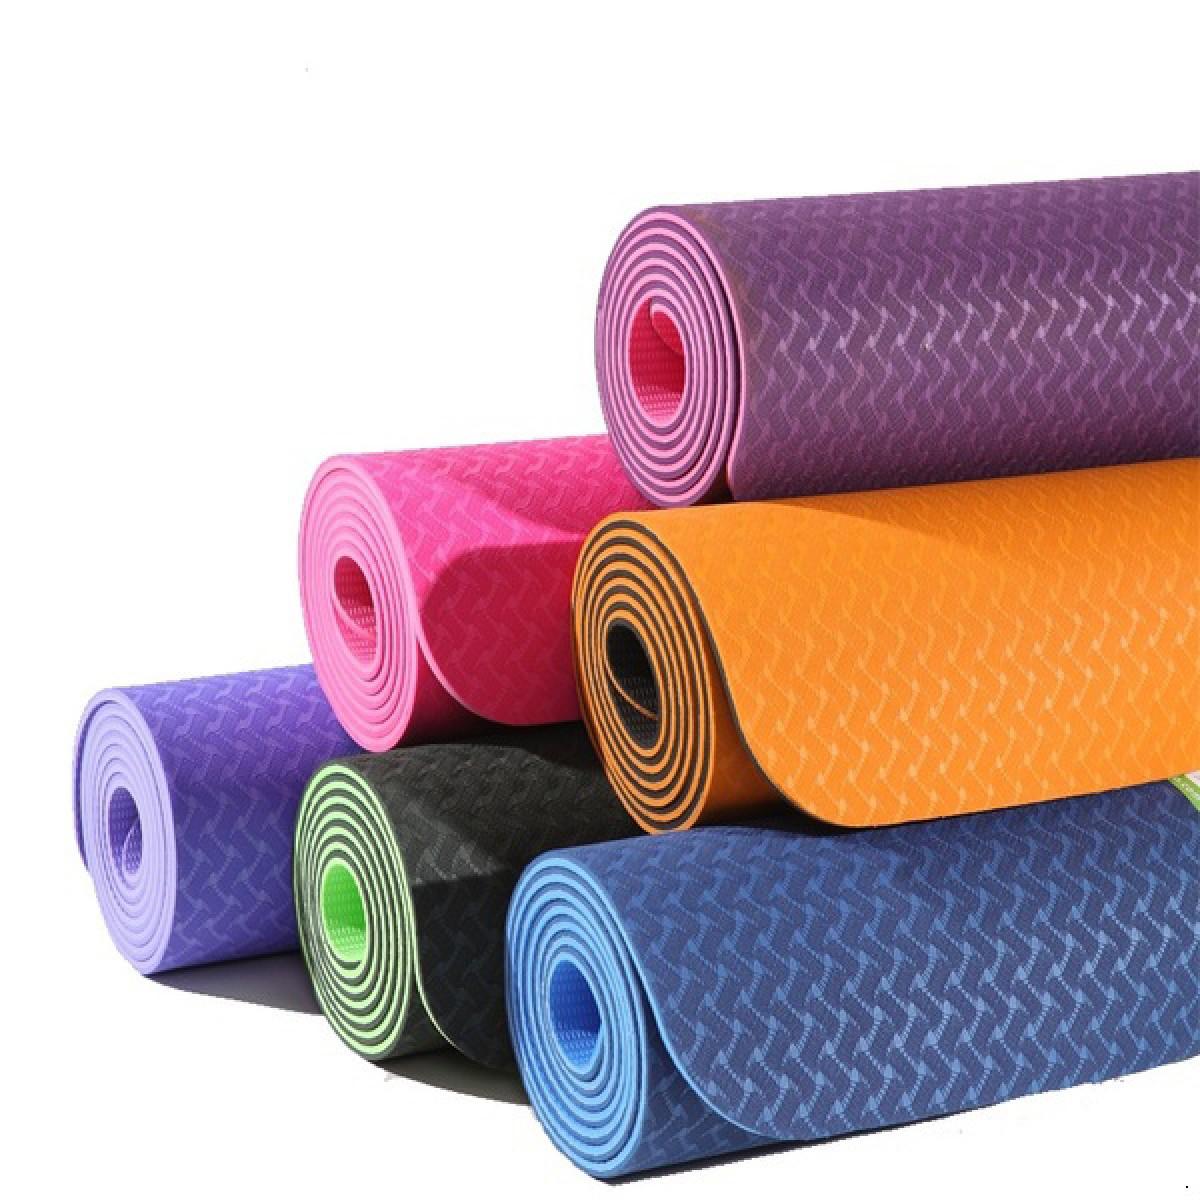 kovrik-dlya-fitnesa-tpetc-4mm-fi-3973-yoga-mat